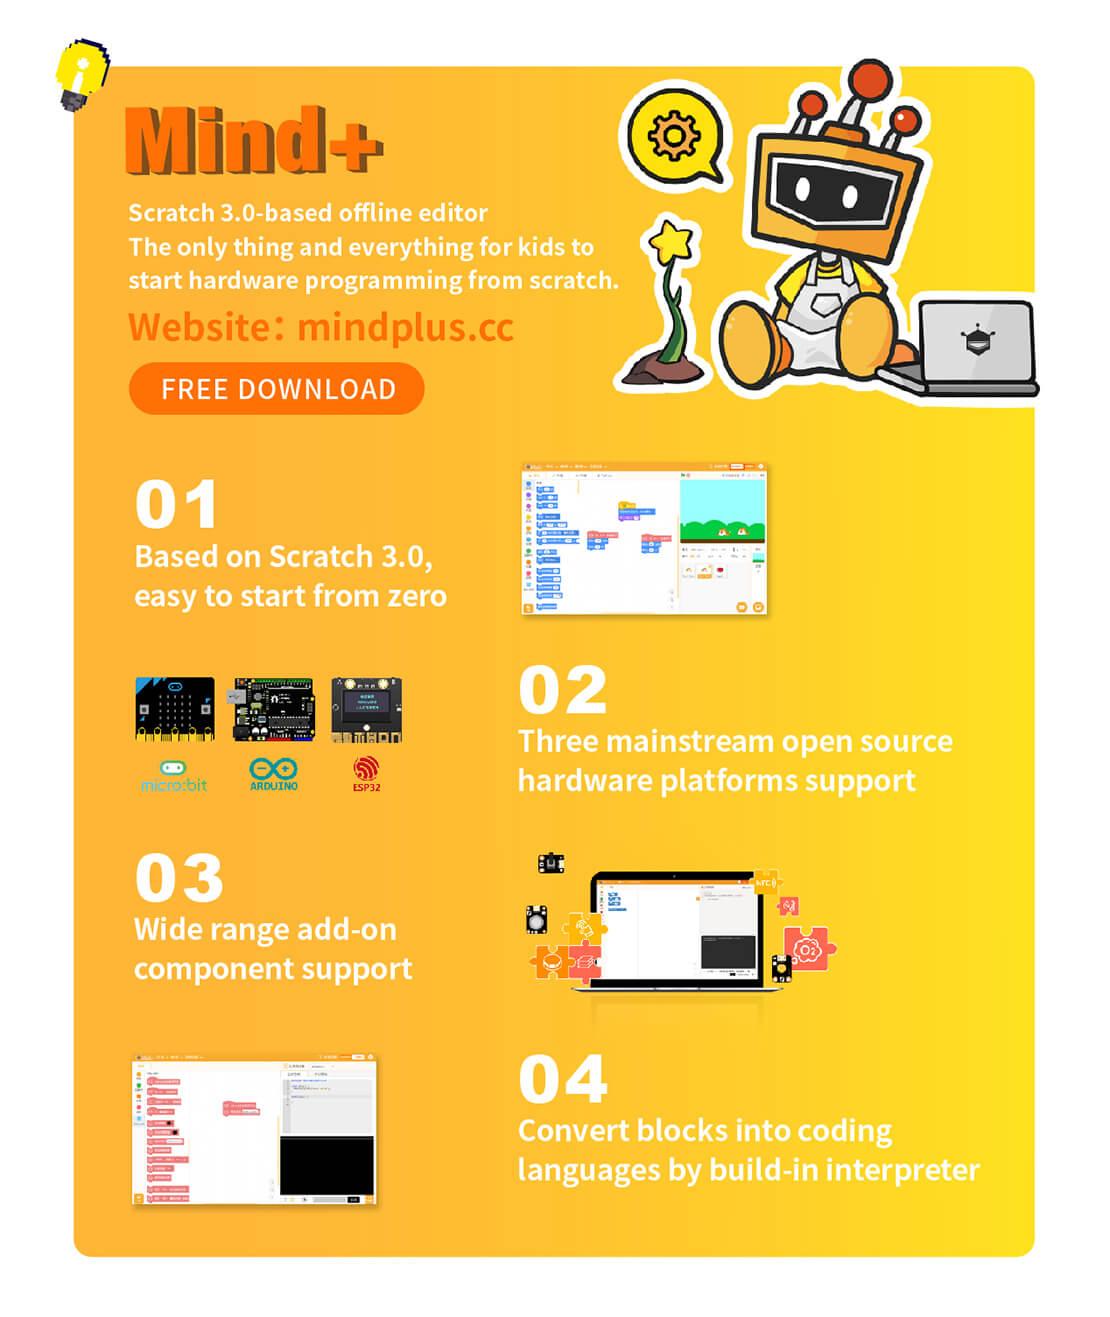 mindplus